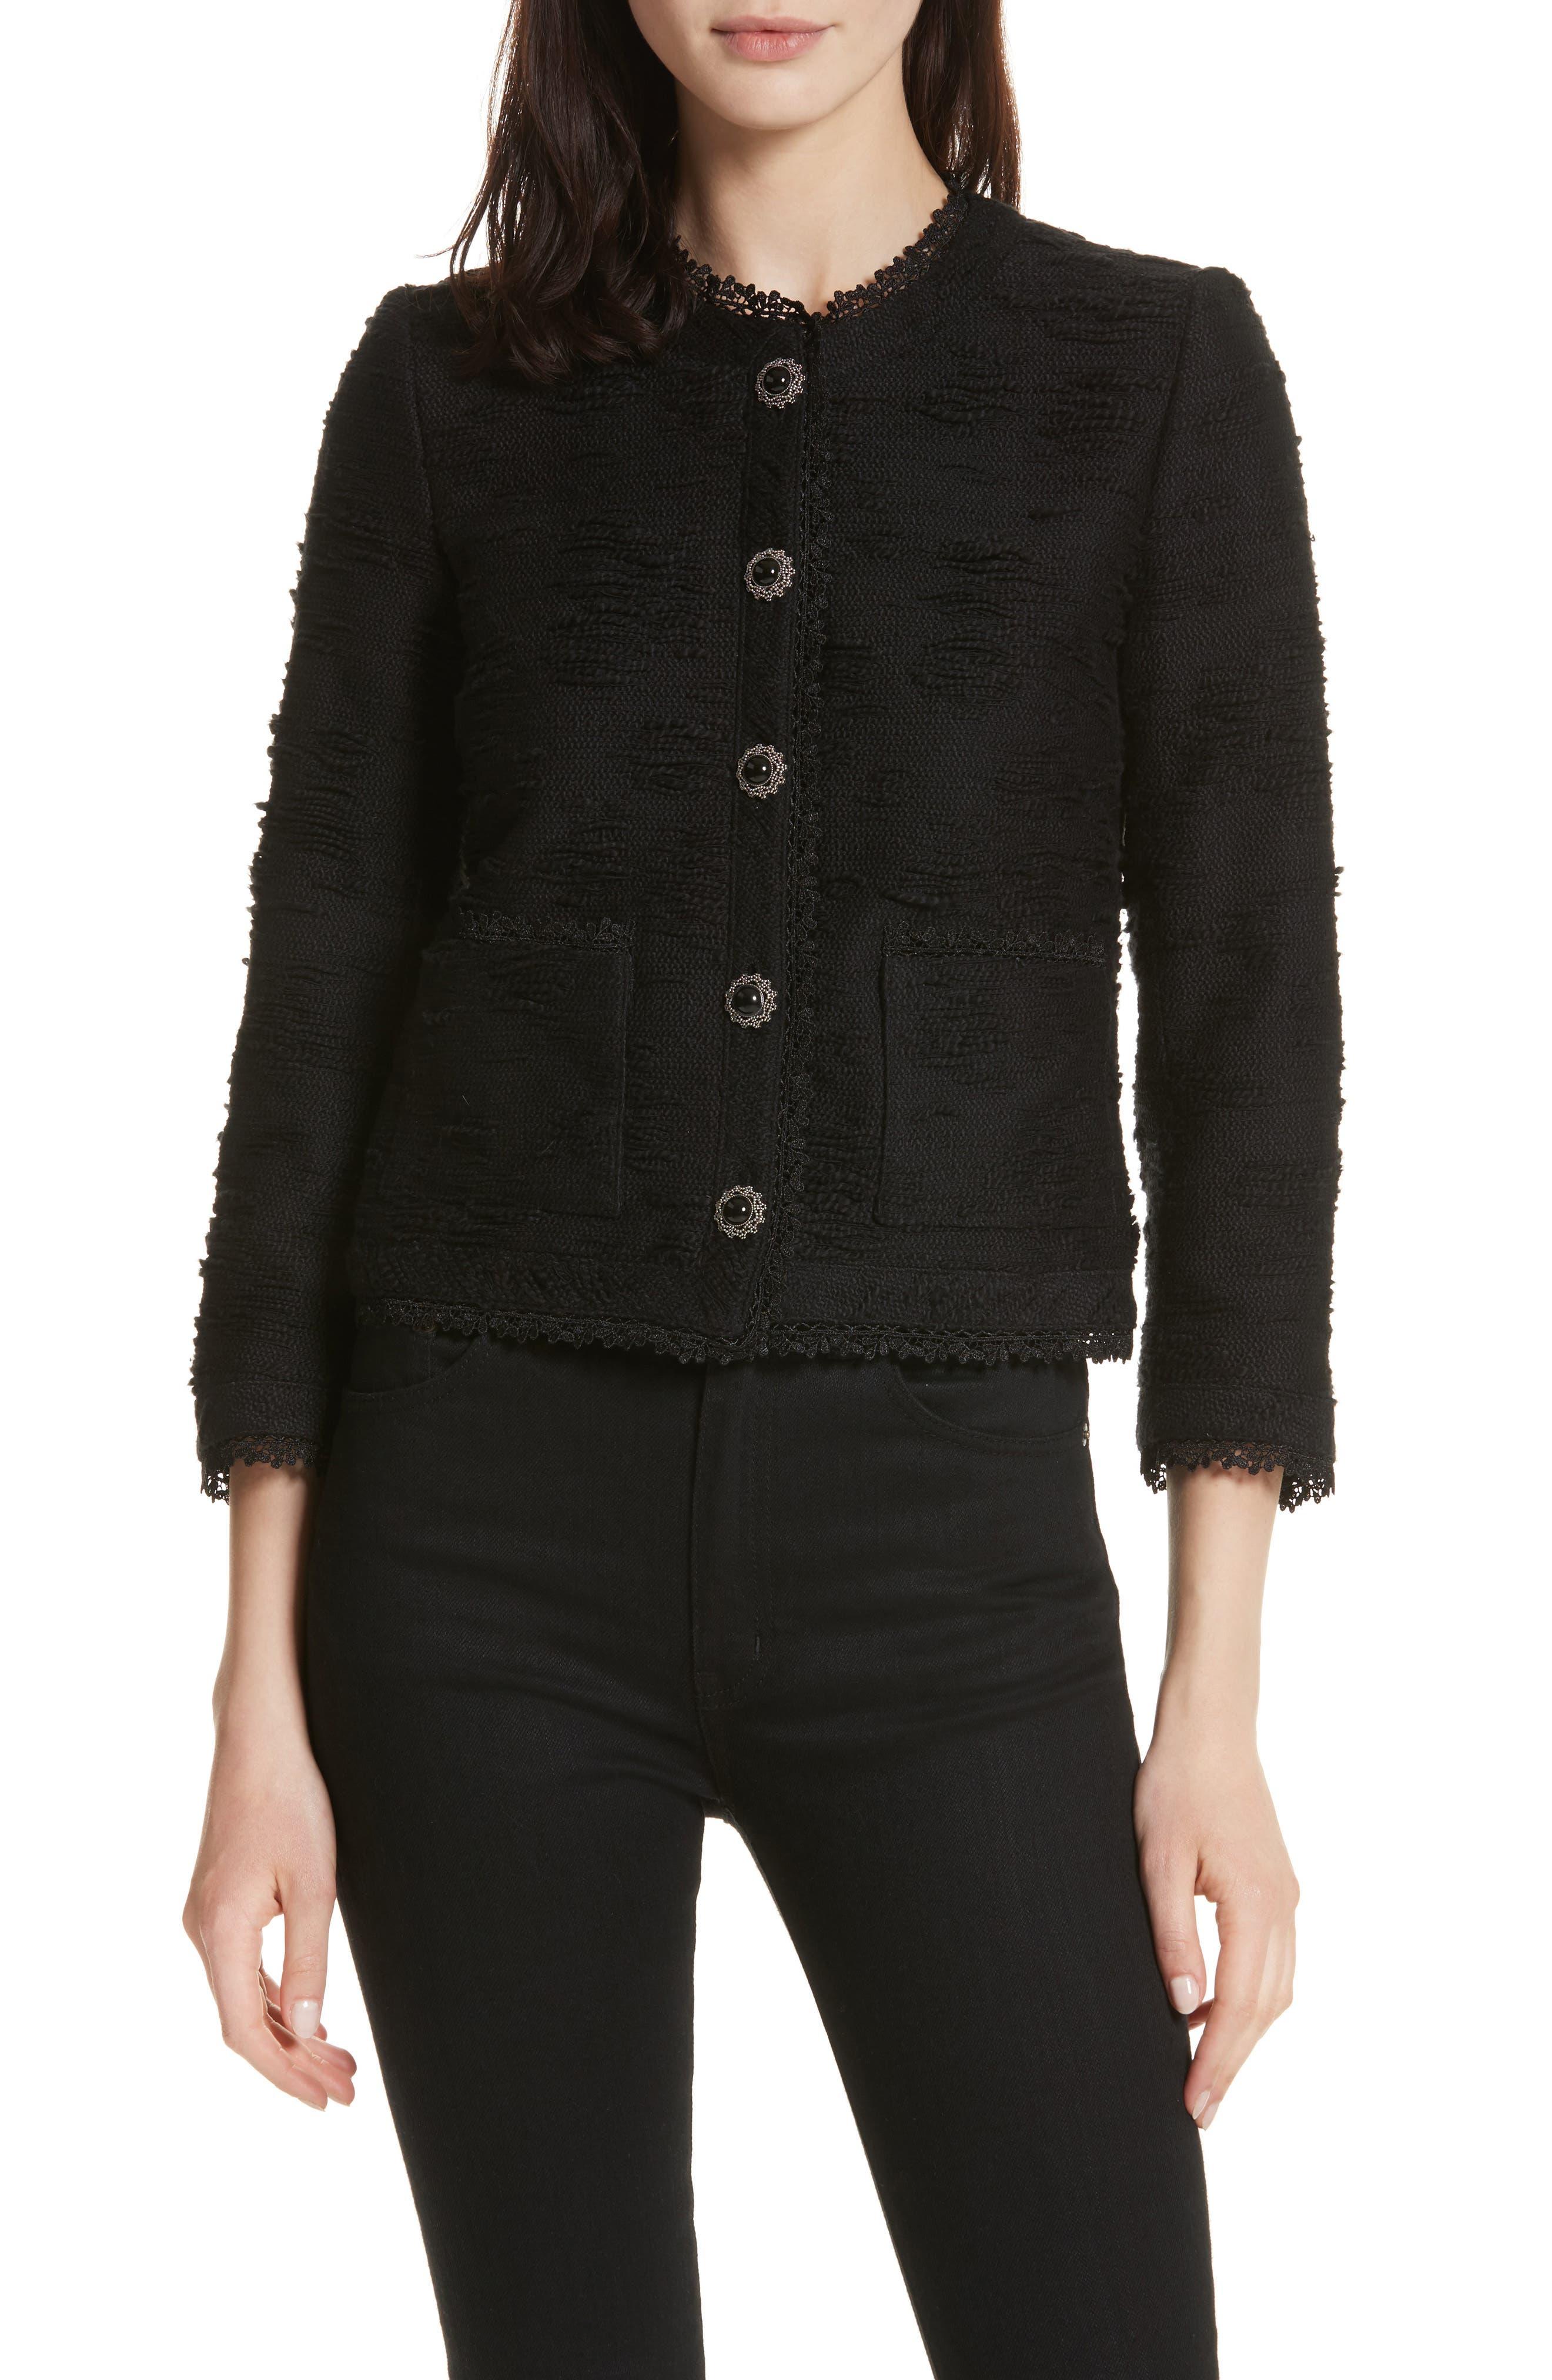 The Kooples Lace Trim Boxy Jacket